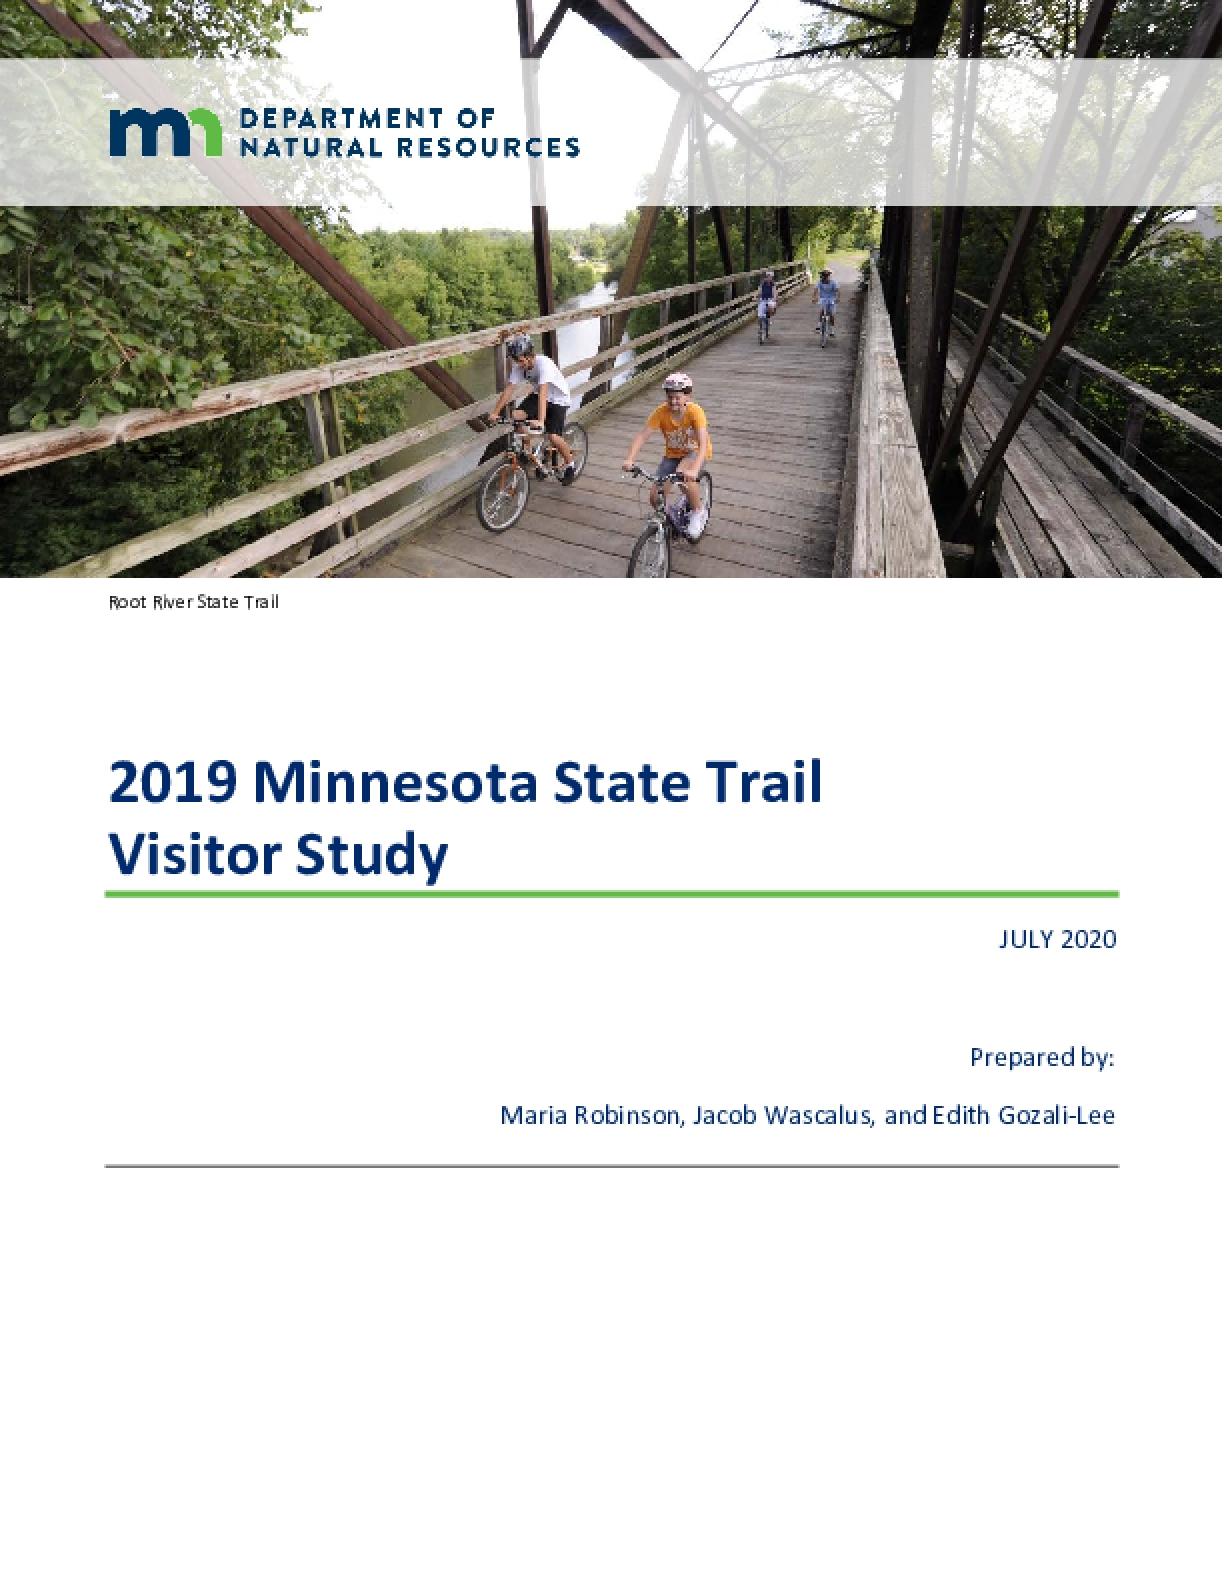 2019 Minnesota State Trail Visitor Study